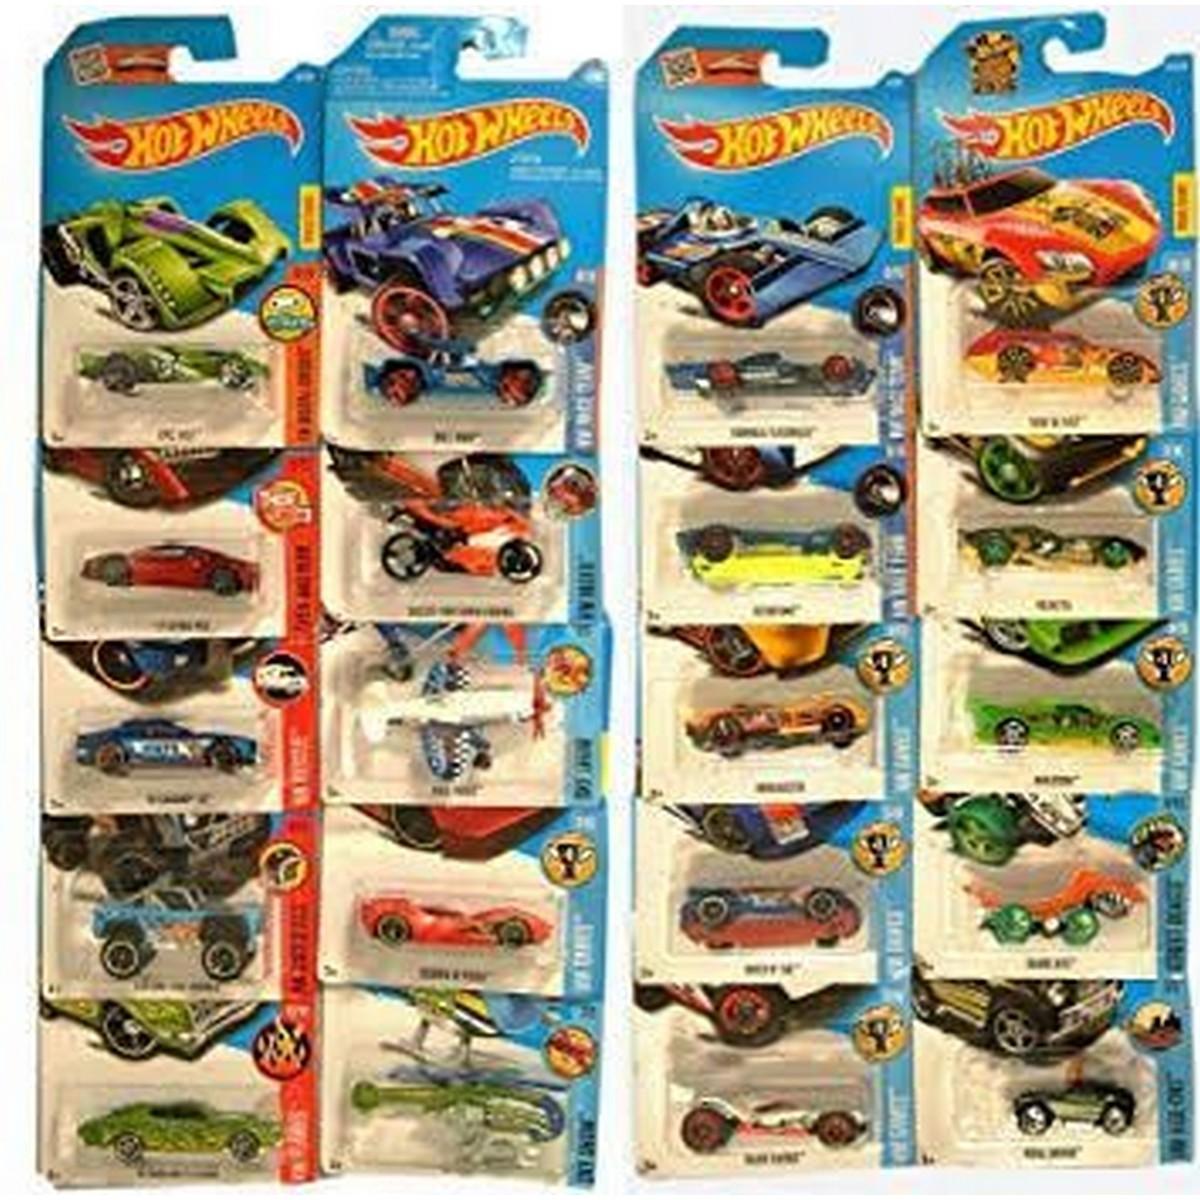 Metal Hot Wheels Cars For kids